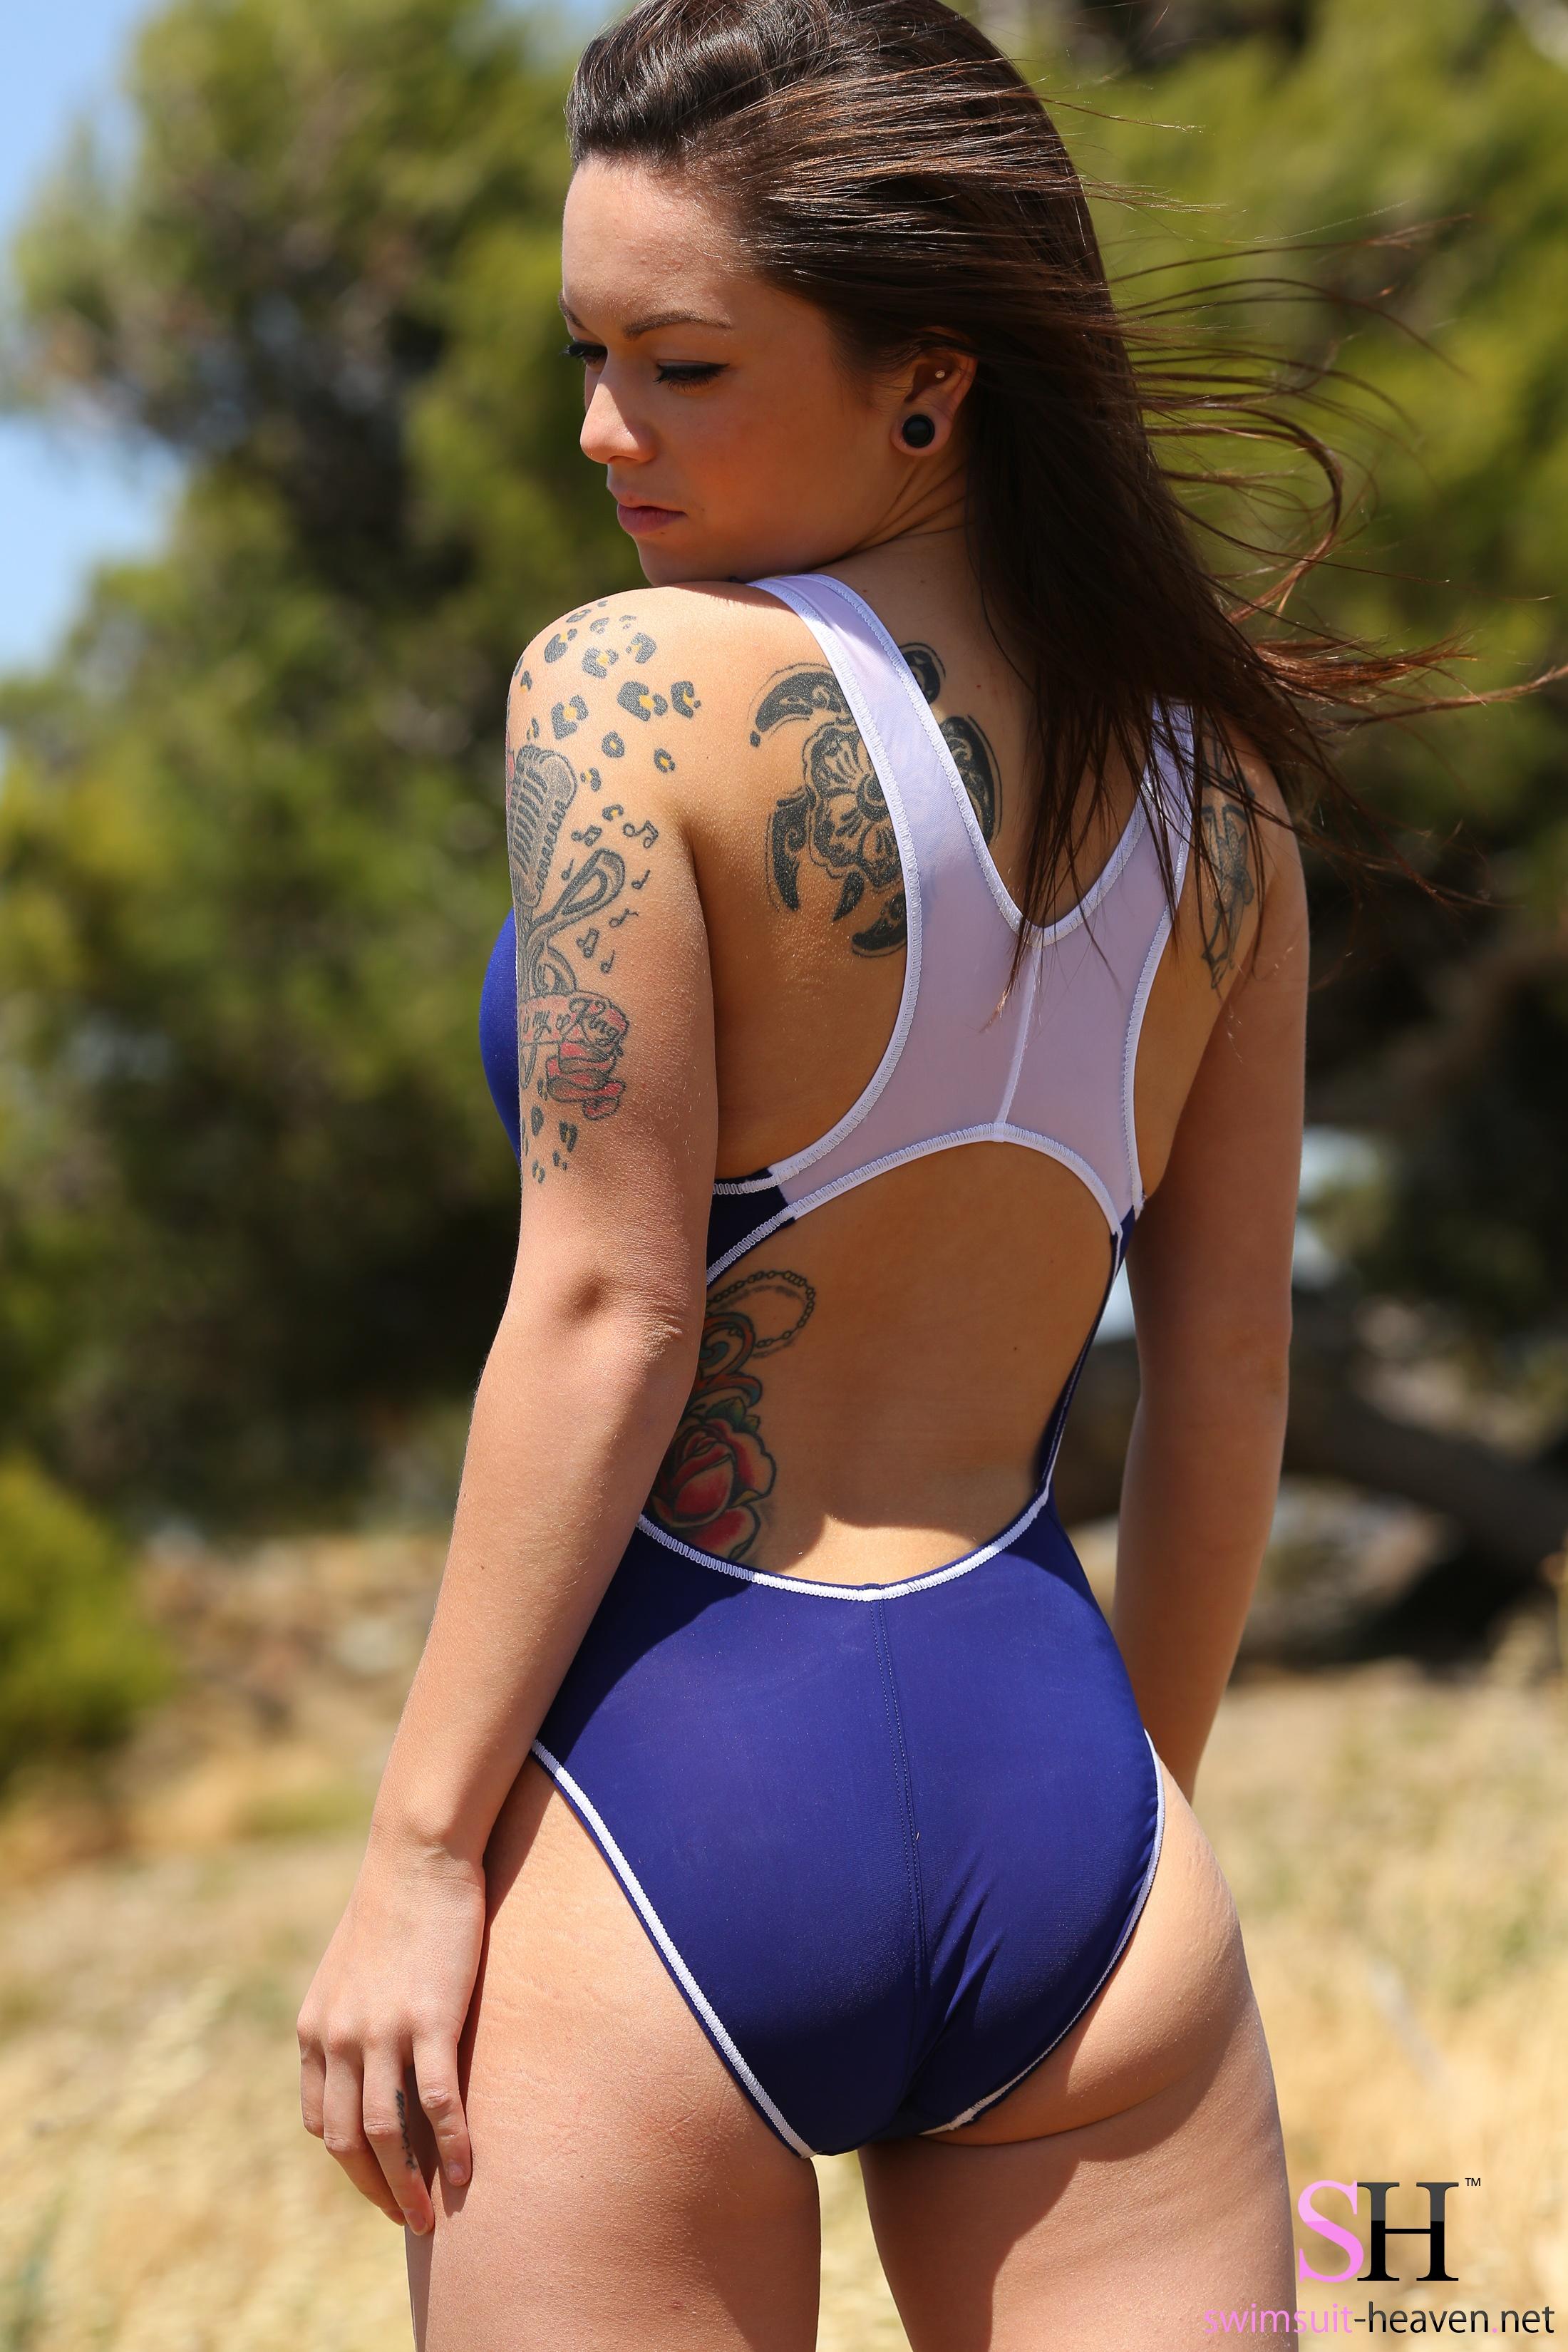 Sexy Tattoo On Girl 2